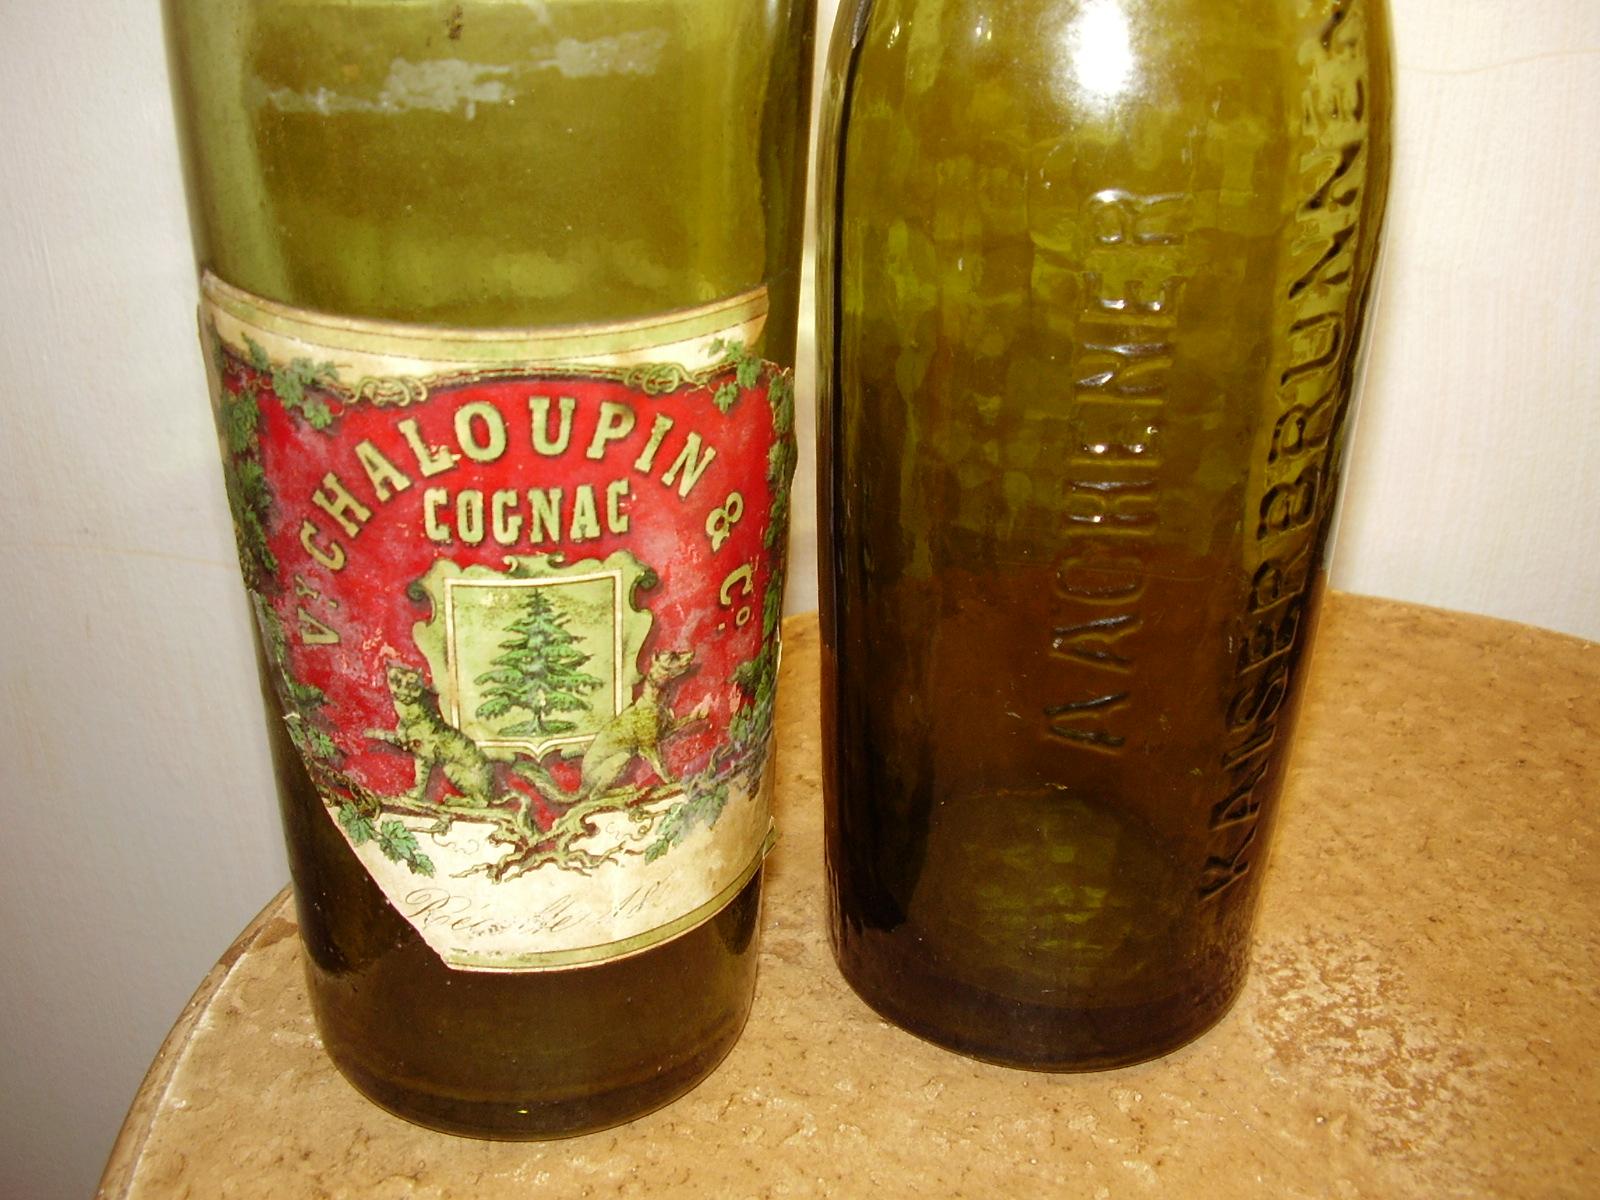 1800-Chaloupin-Co-Cognac-bottle